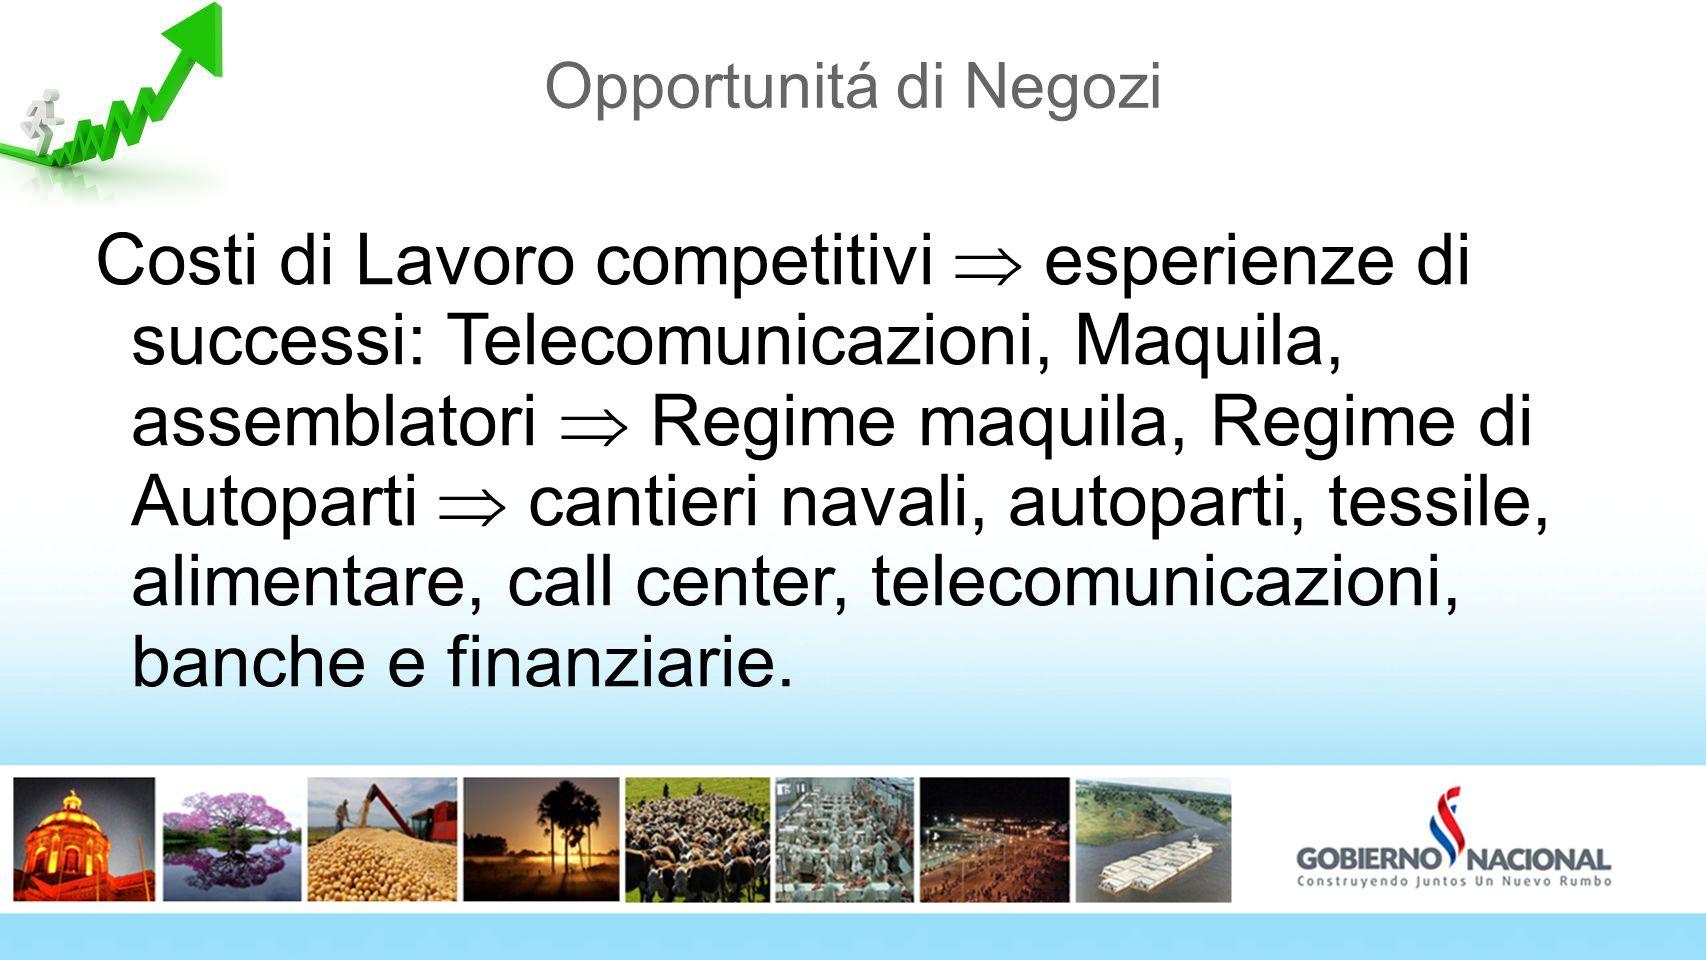 Opportunitá di Negozi Costi di Lavoro competitivi esperienze di successi: Telecomunicazioni, Maquila, assemblatori Regime maquila, Regime di Autoparti